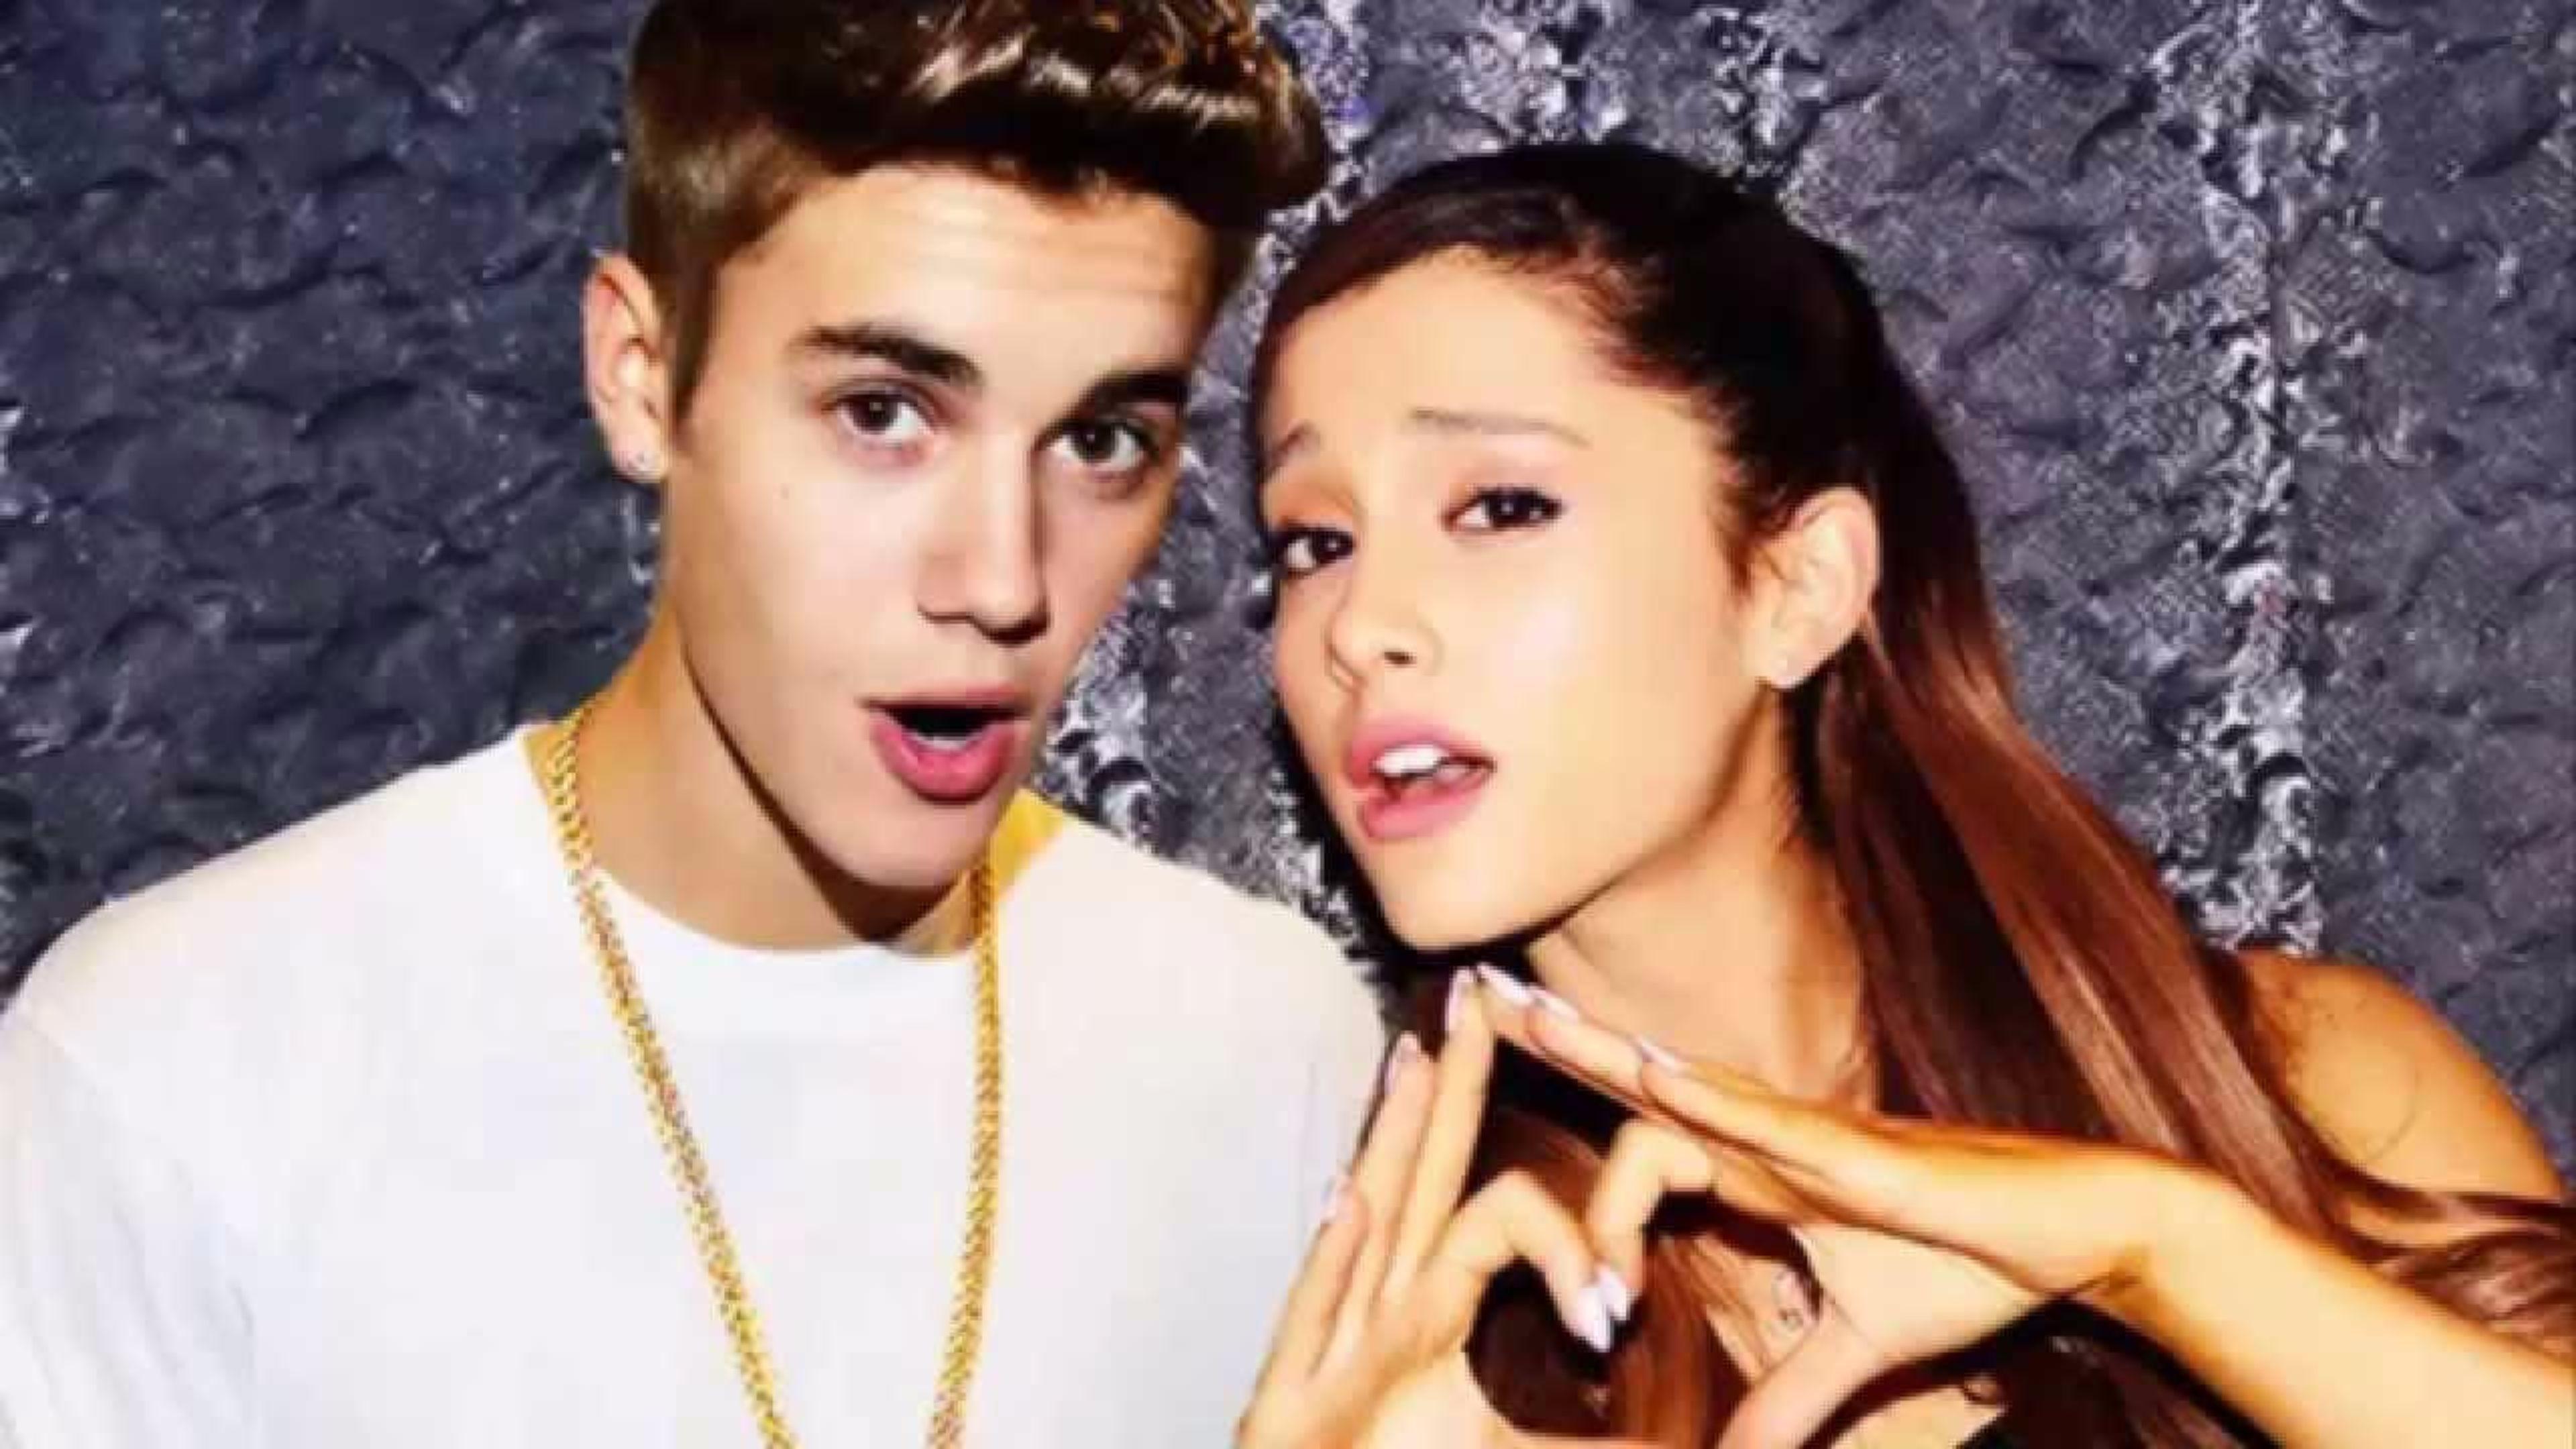 Justin Bieber and 4K Ariana Grande Wallpaper | Free 4K Wallpaper